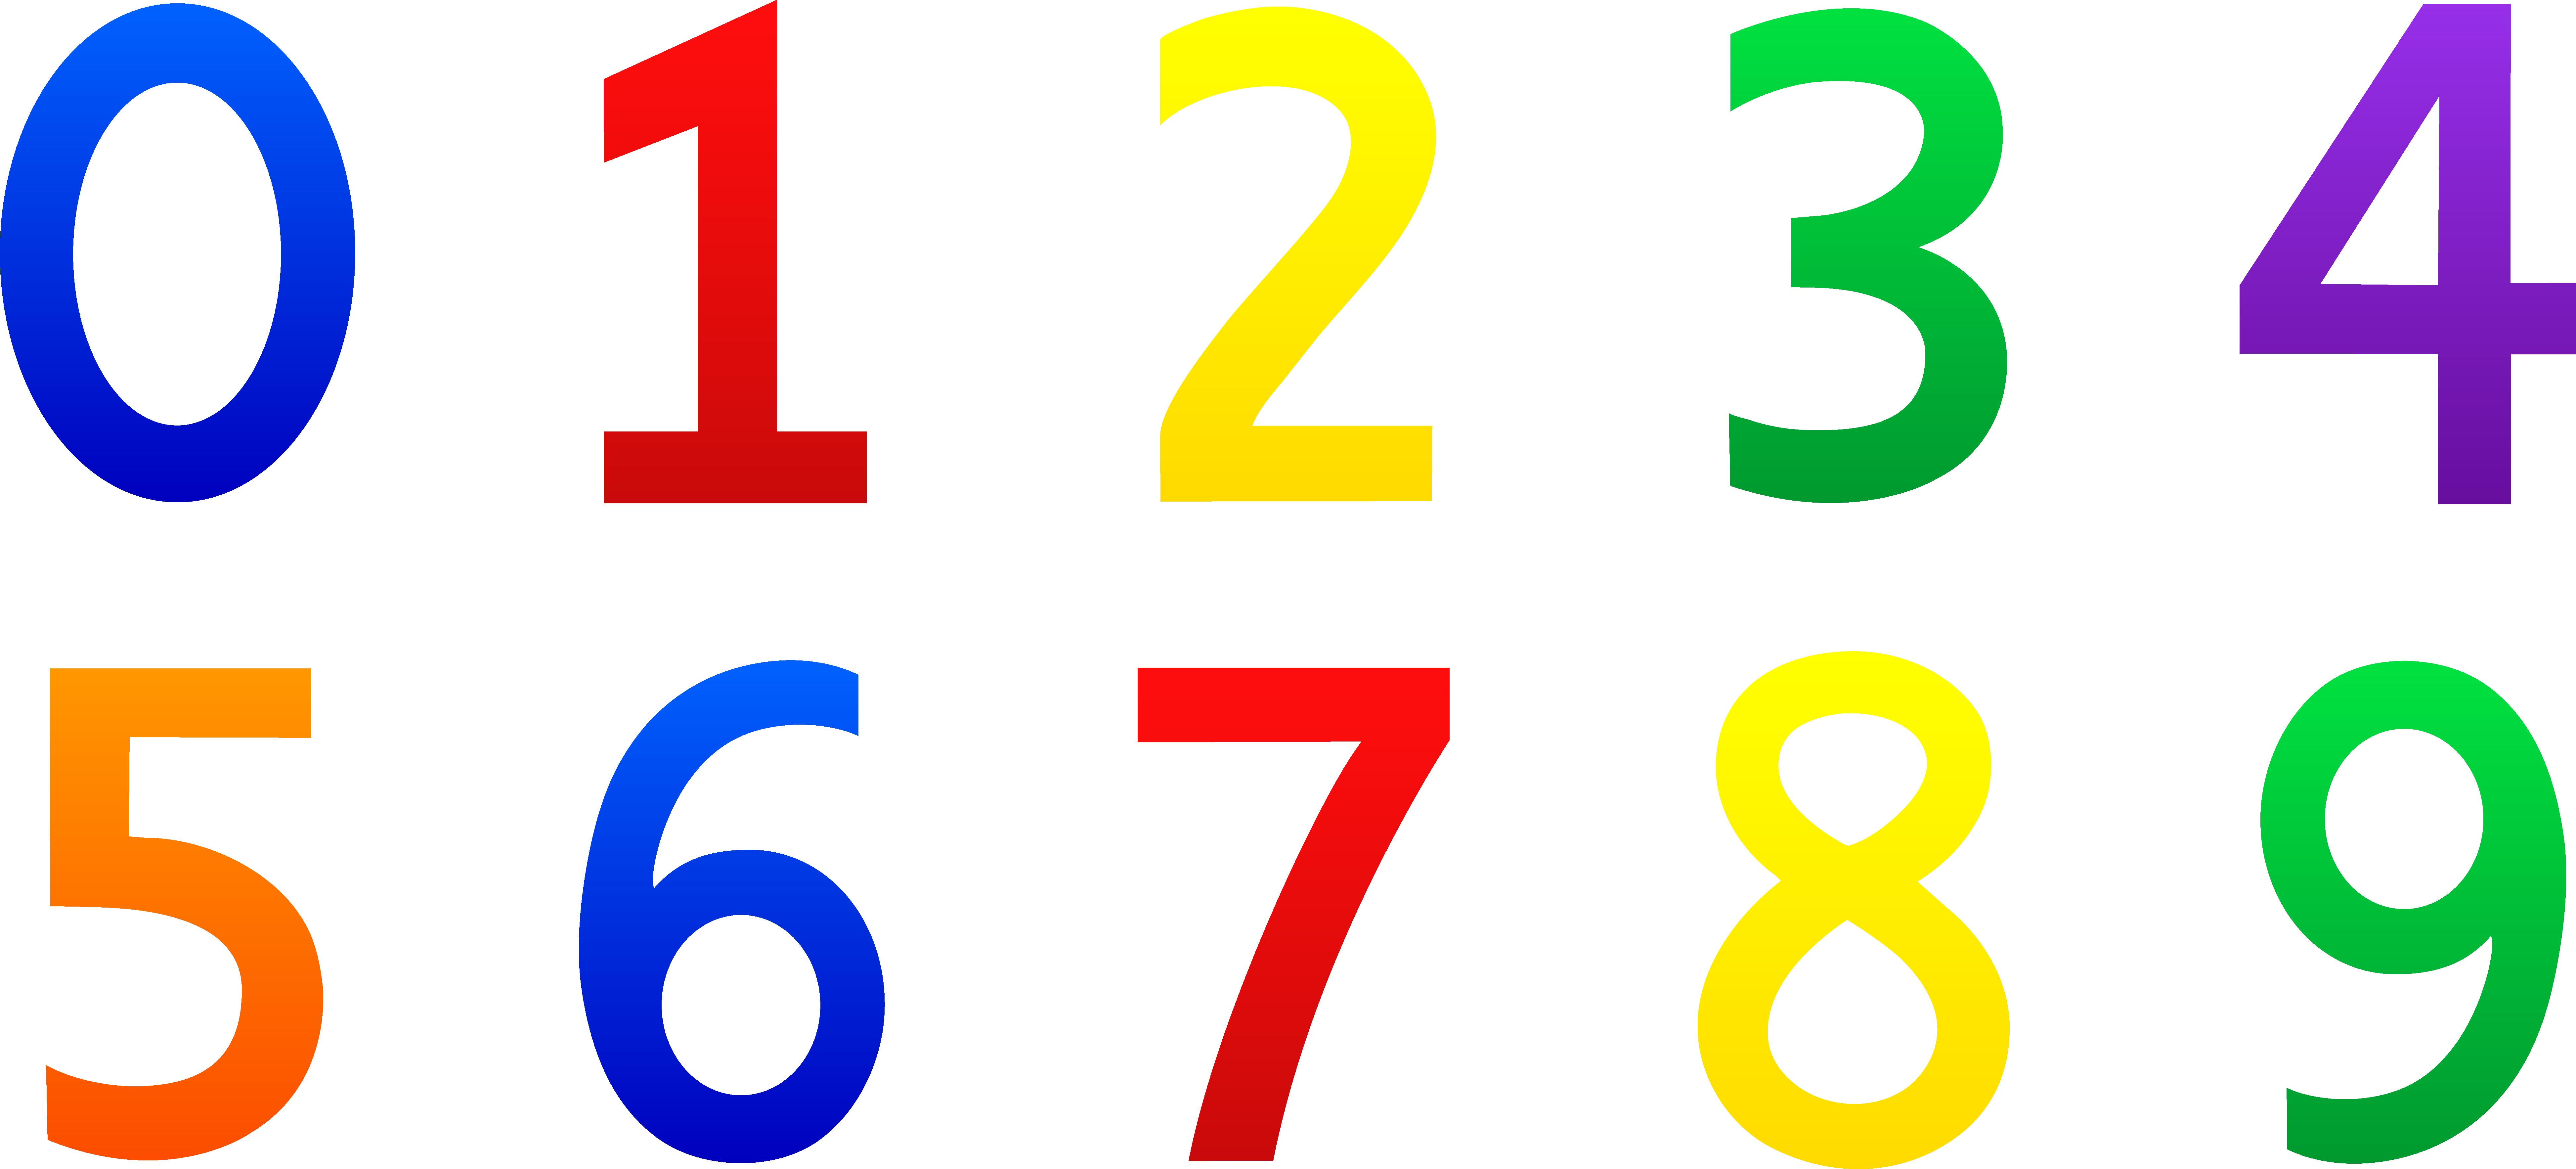 Number 4 clipart natural number, Number 4 natural number.